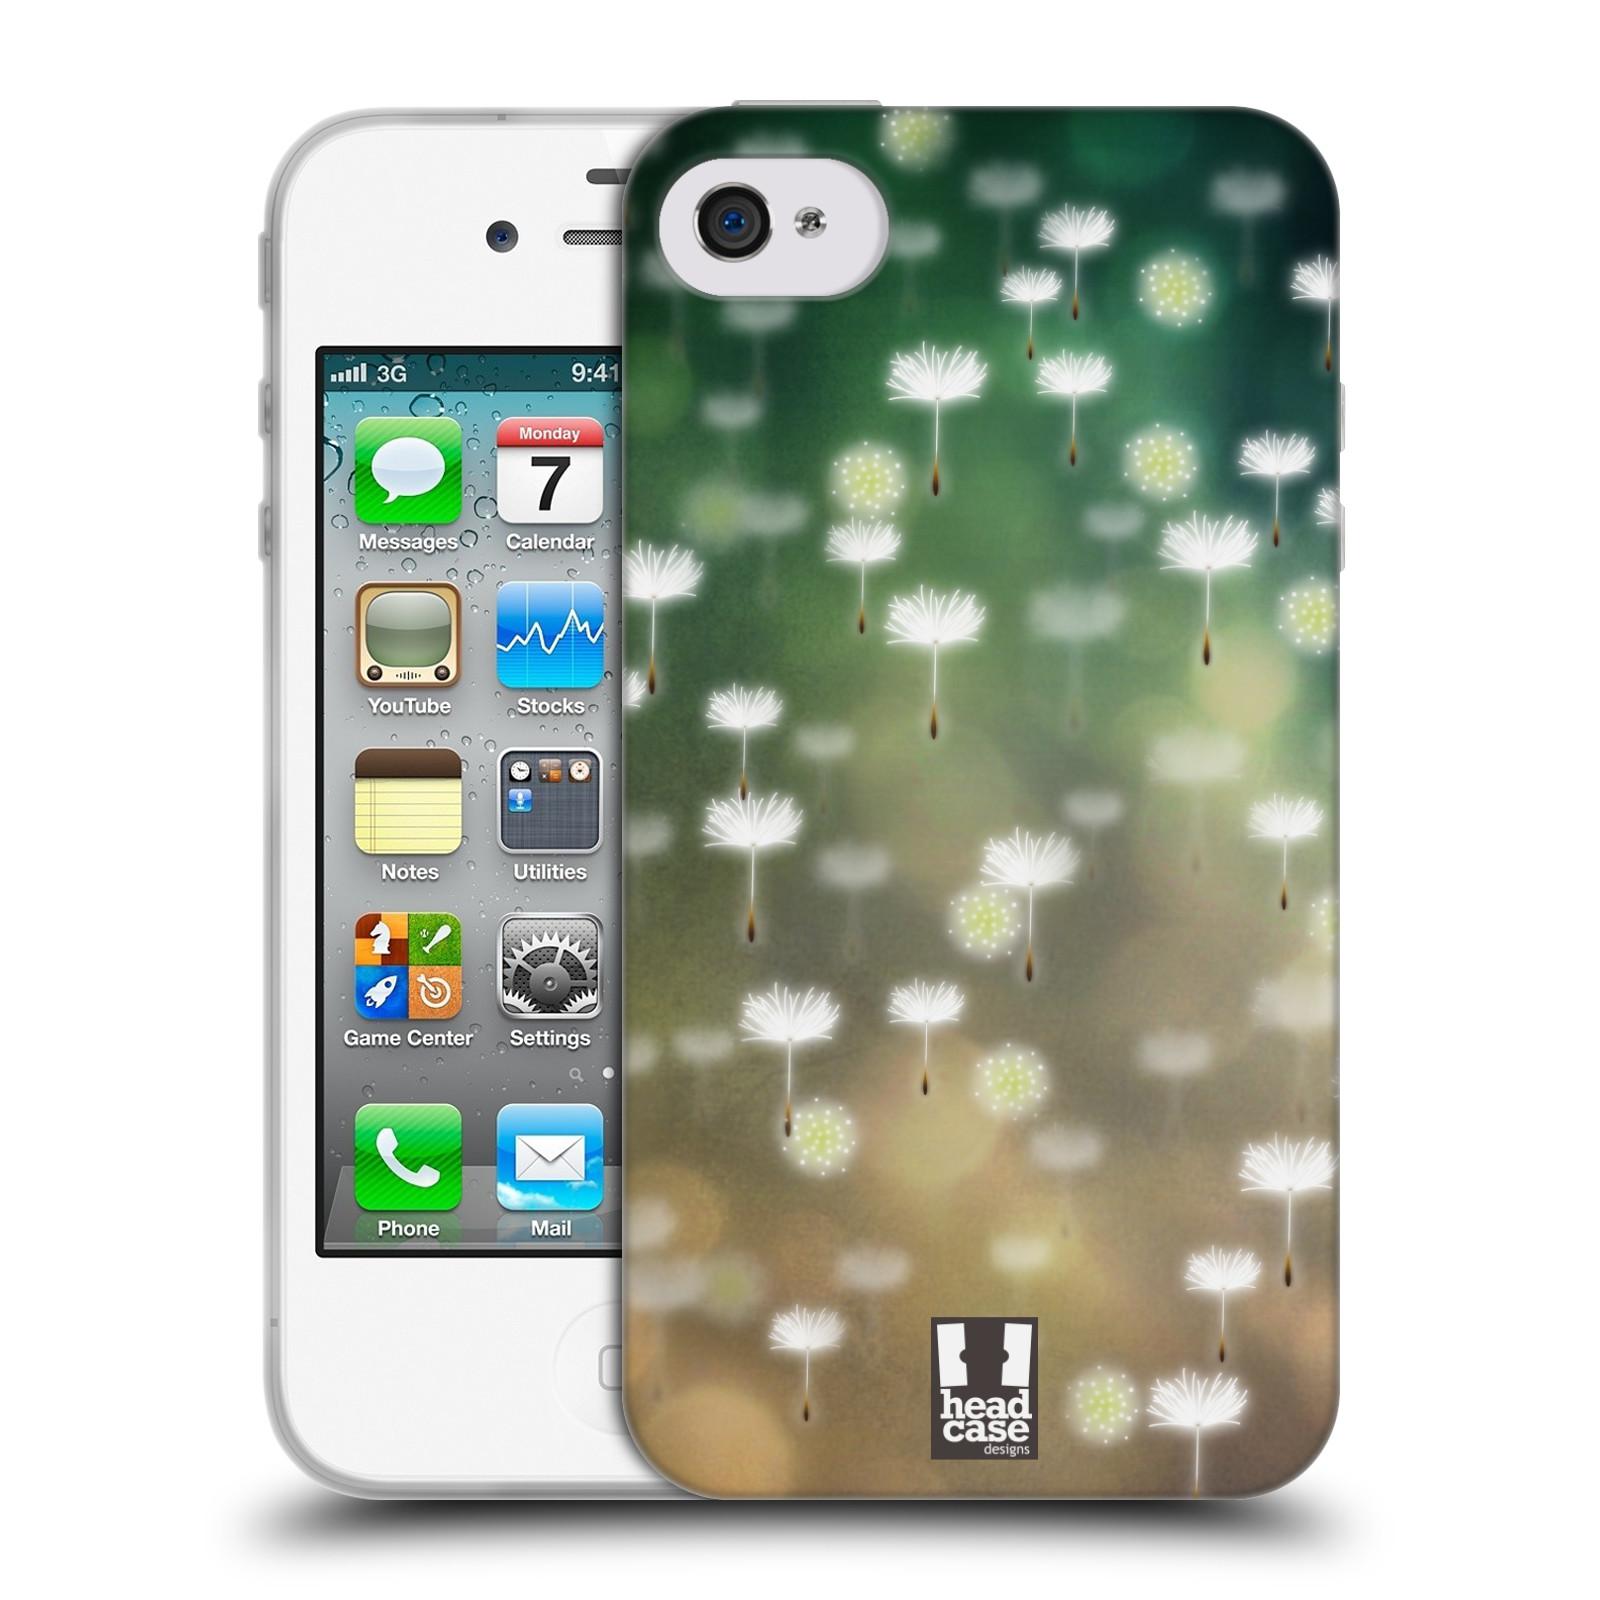 Silikonové pouzdro na mobil Apple iPhone 4 a 4S HEAD CASE Pampeliškové padáčky (Silikonový kryt či obal na mobilní telefon Apple iPhone 4 a 4S)